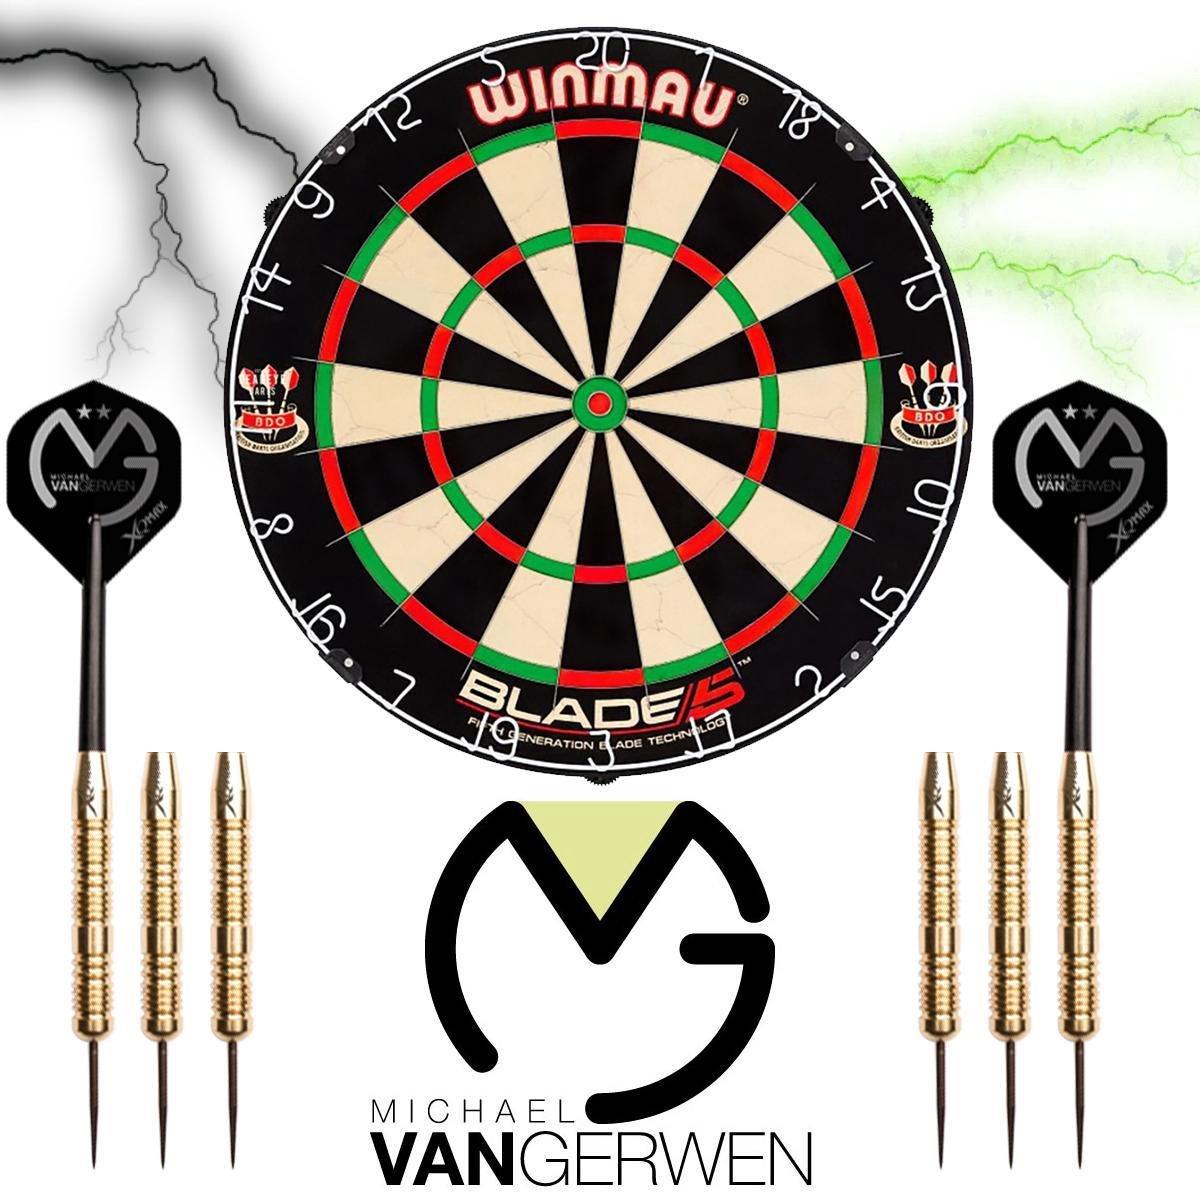 Winmau set - Blade 5 - dartbord - plus 2 sets - Michael van Gerwen dartpijlen - dartpijlen